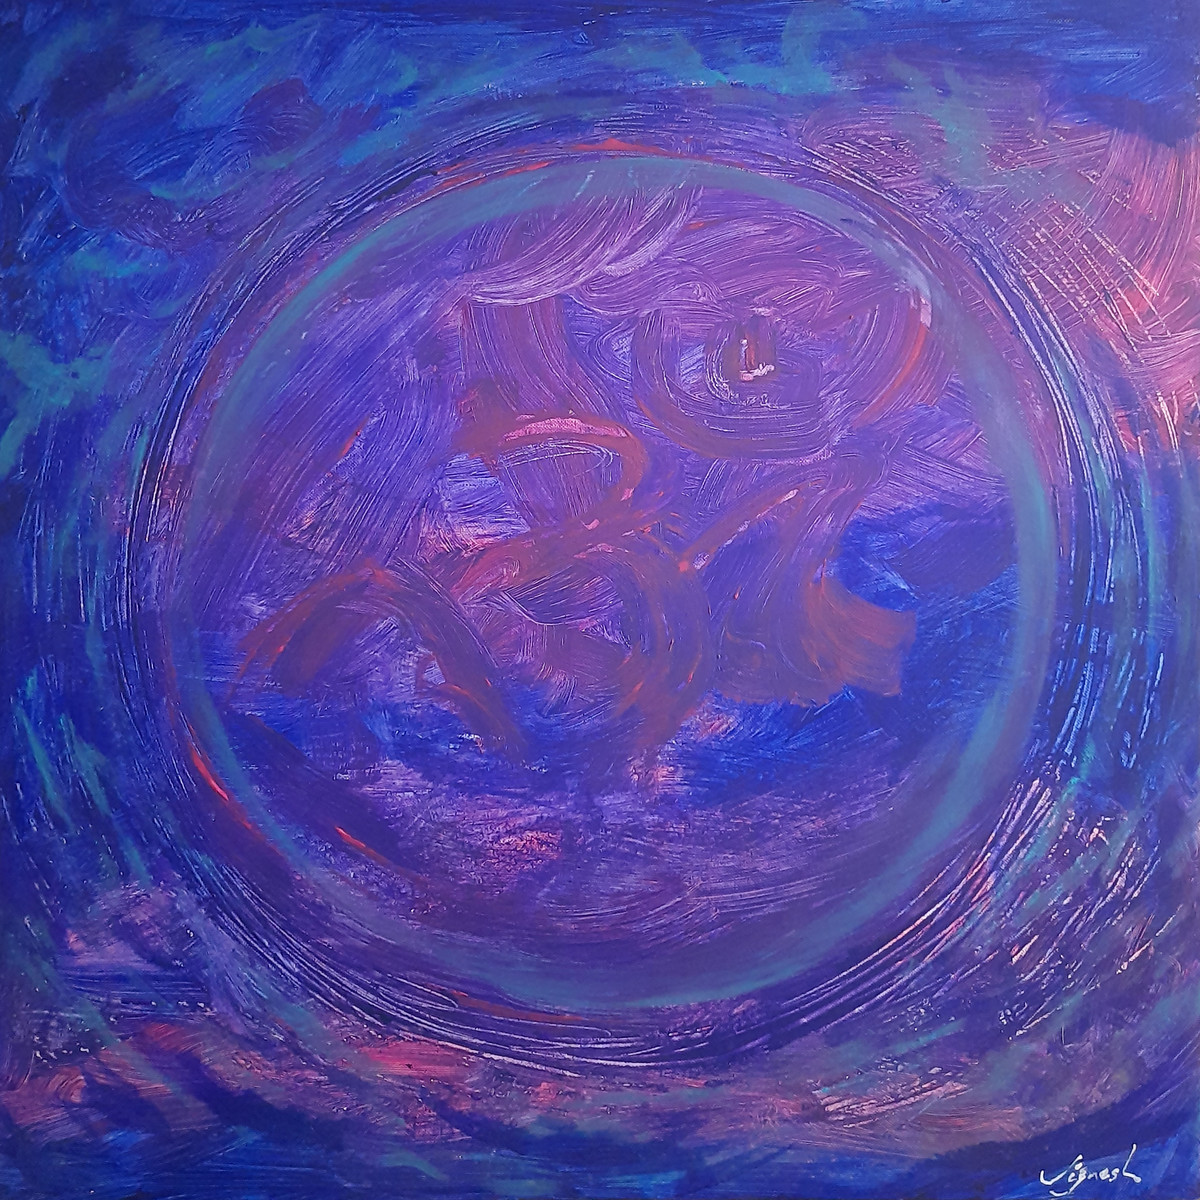 Aumkaar by Jignesh Jariwala, Abstract Painting, Acrylic on Canvas, Victoria color